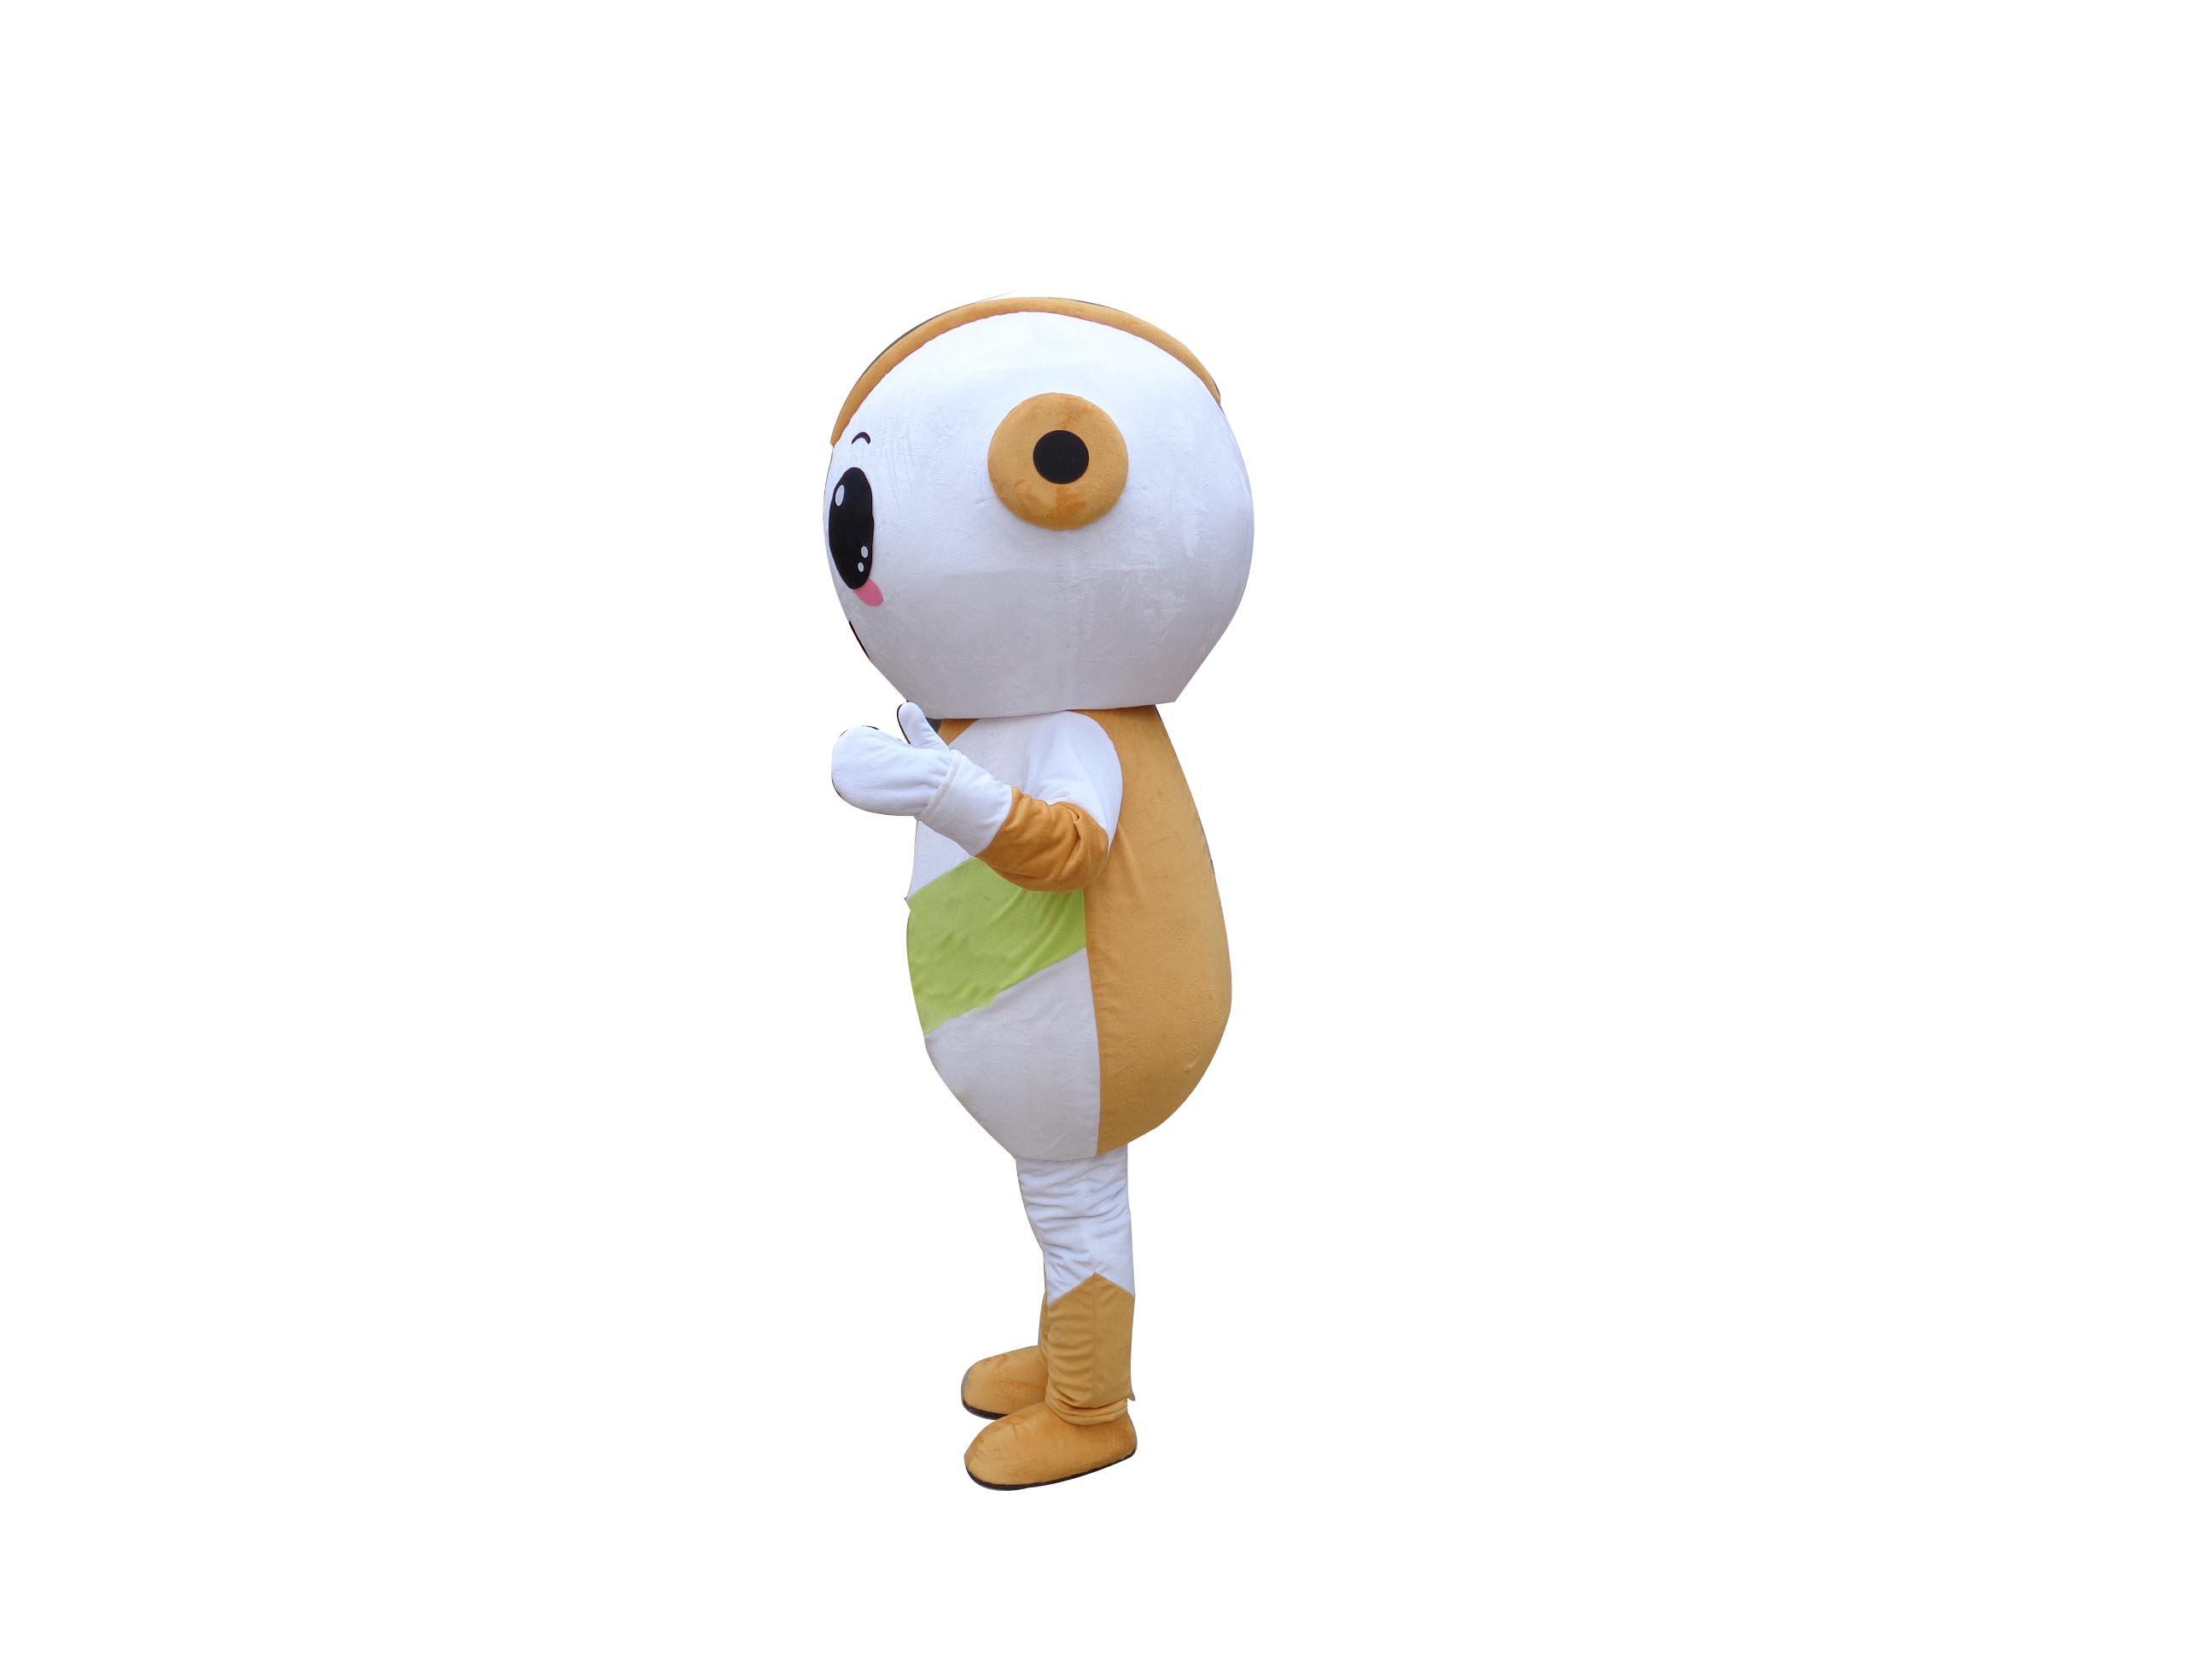 Bump Man Cartoon Doll Cartoon Walking Doll Clothing Hedging Bump Man Mascot Costume